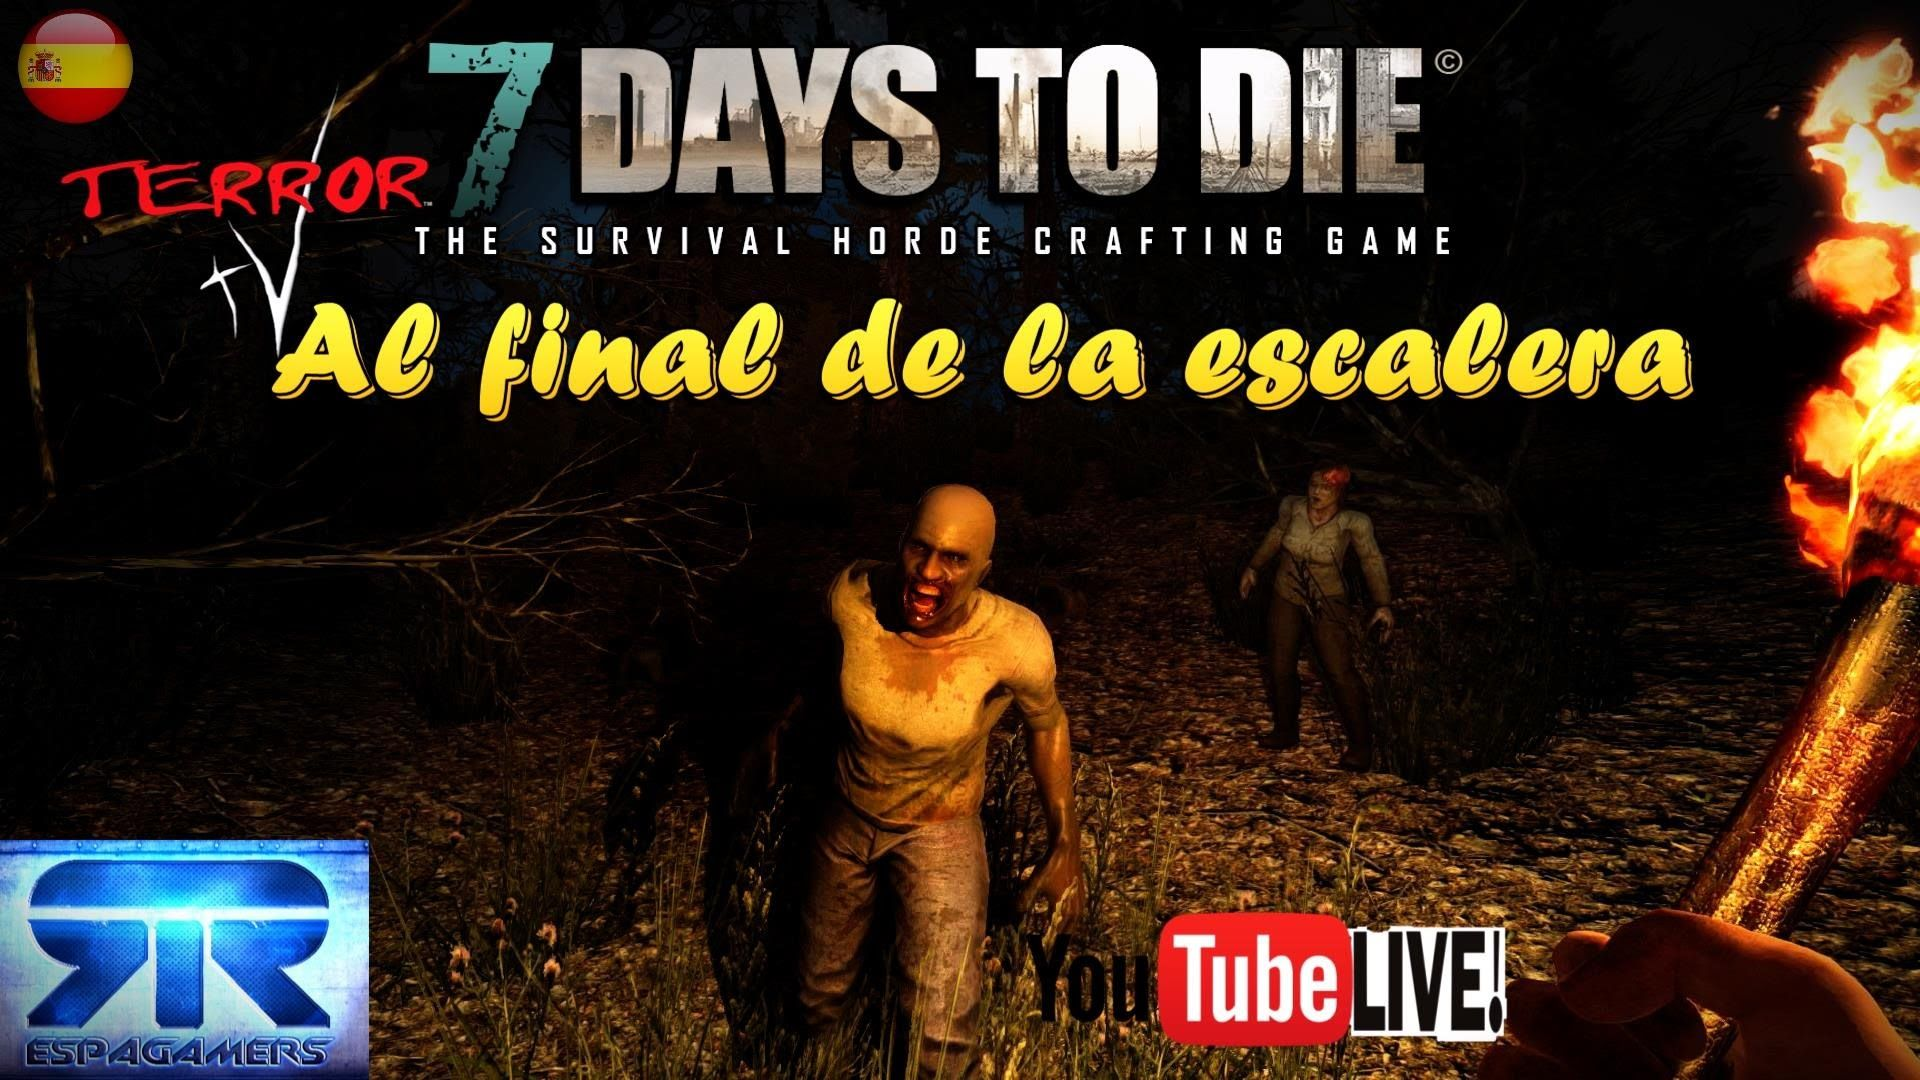 7 Days To Die Live Streaming Hd Español Al Final De La